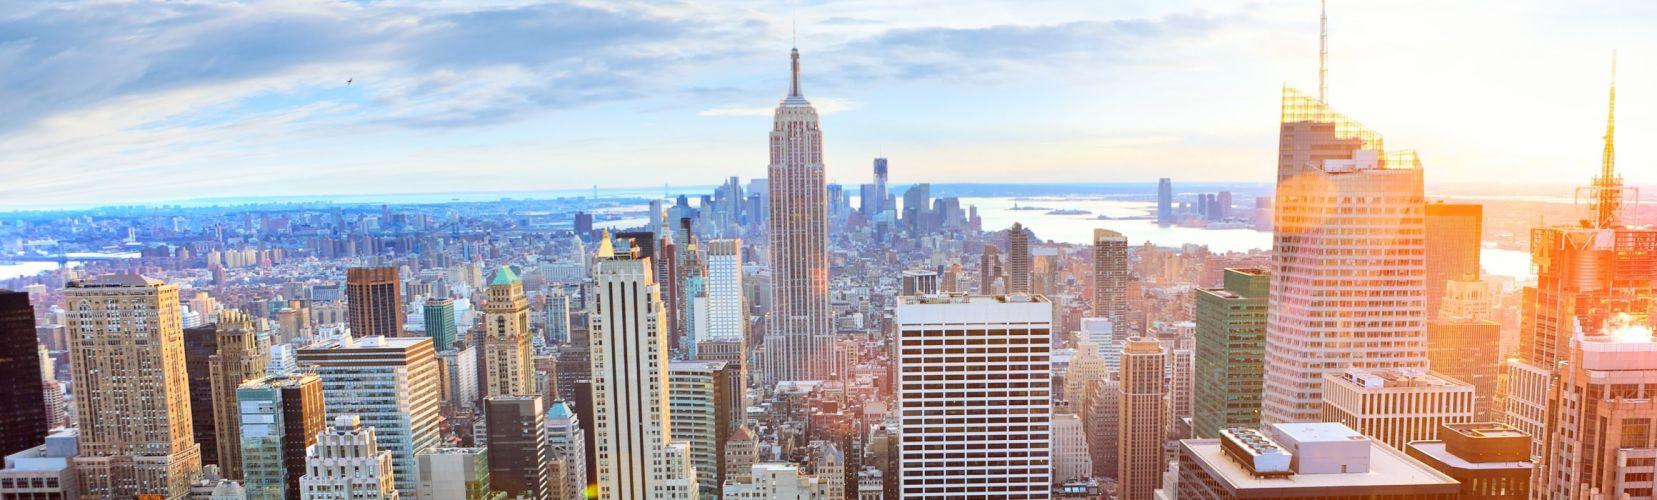 Empire State Building New York City Skyline wallpaper